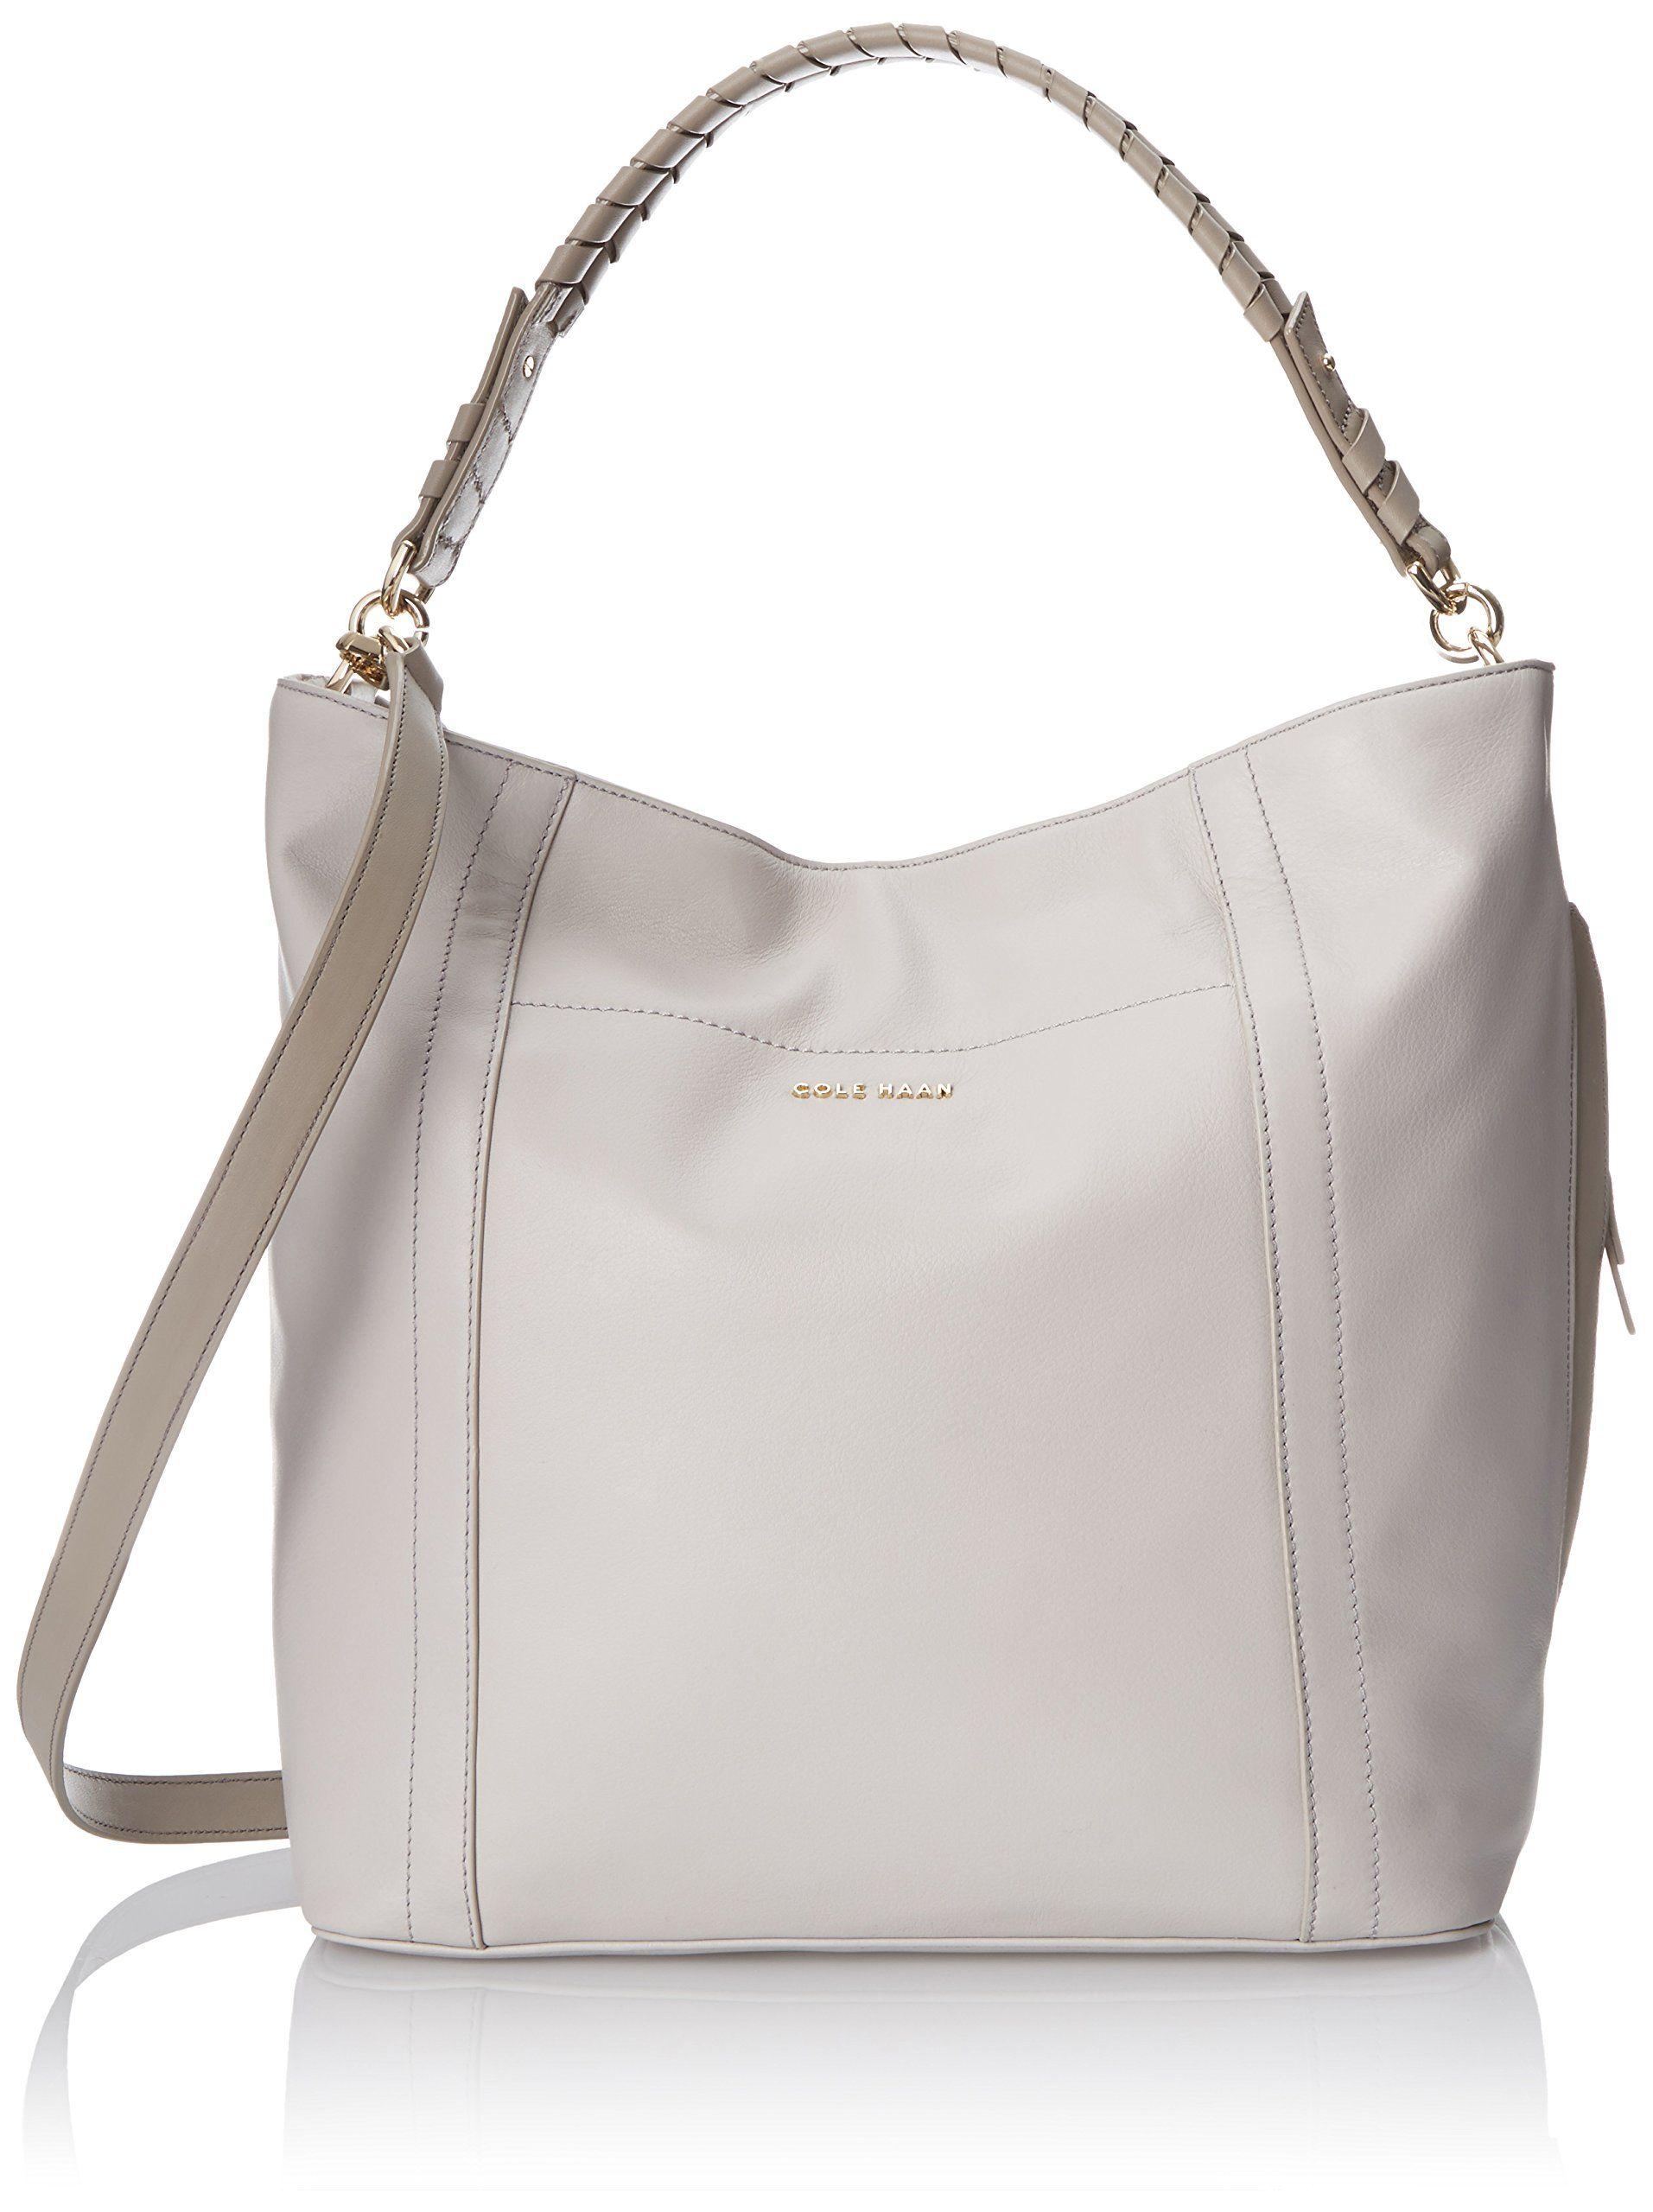 fea1d27b39e5 Cole Haan Felicity Double Strap Hobo Shoulder Bag